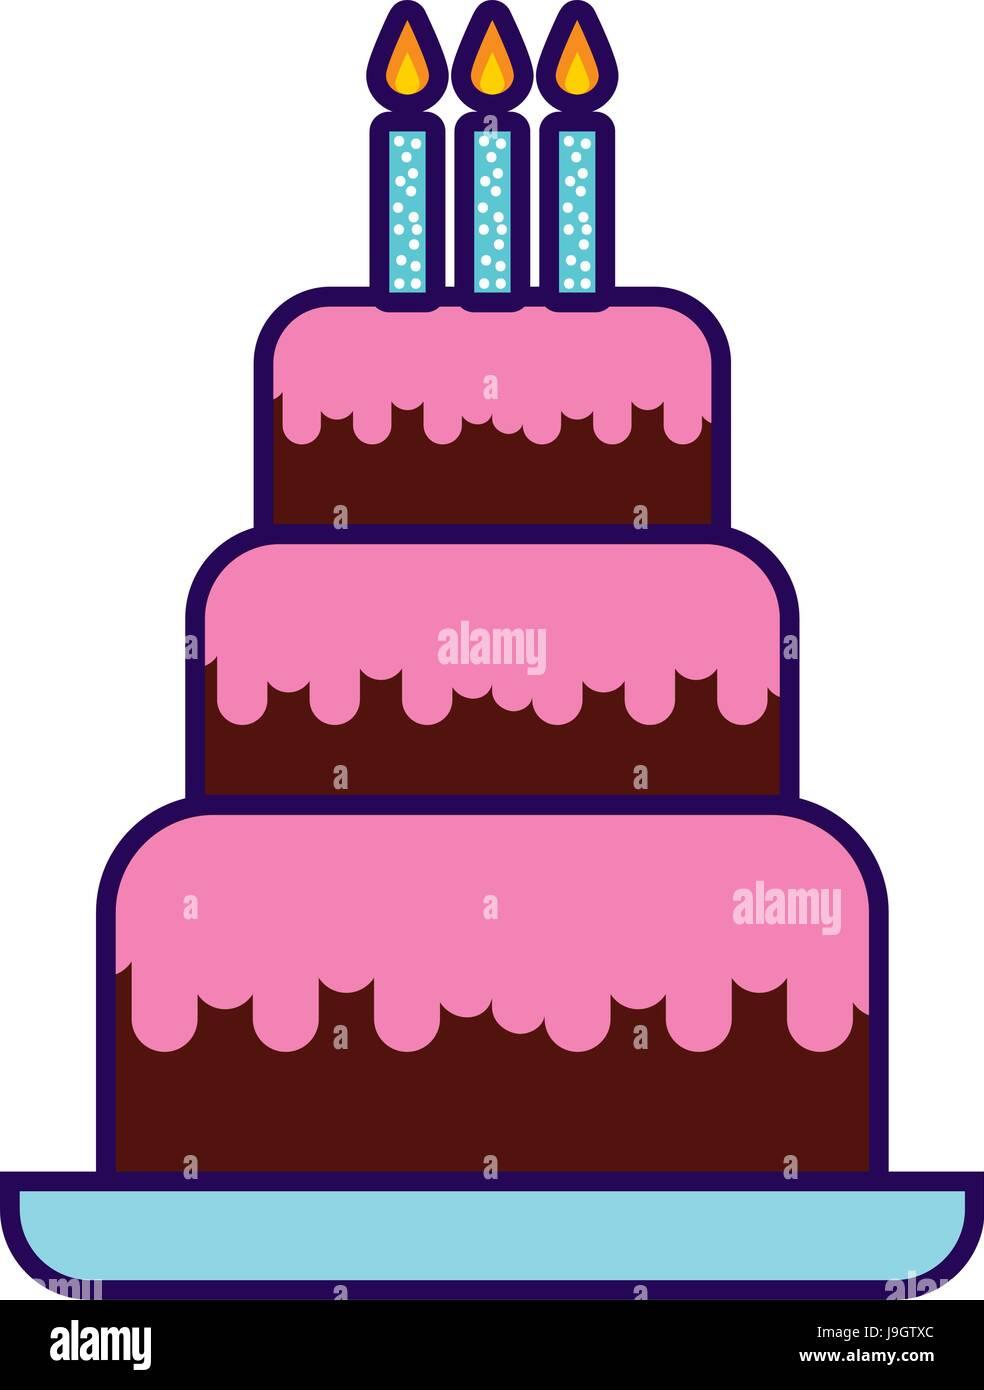 Pleasing Cute Birthday Cake Cartoon Stock Vector Art Illustration Vector Personalised Birthday Cards Veneteletsinfo